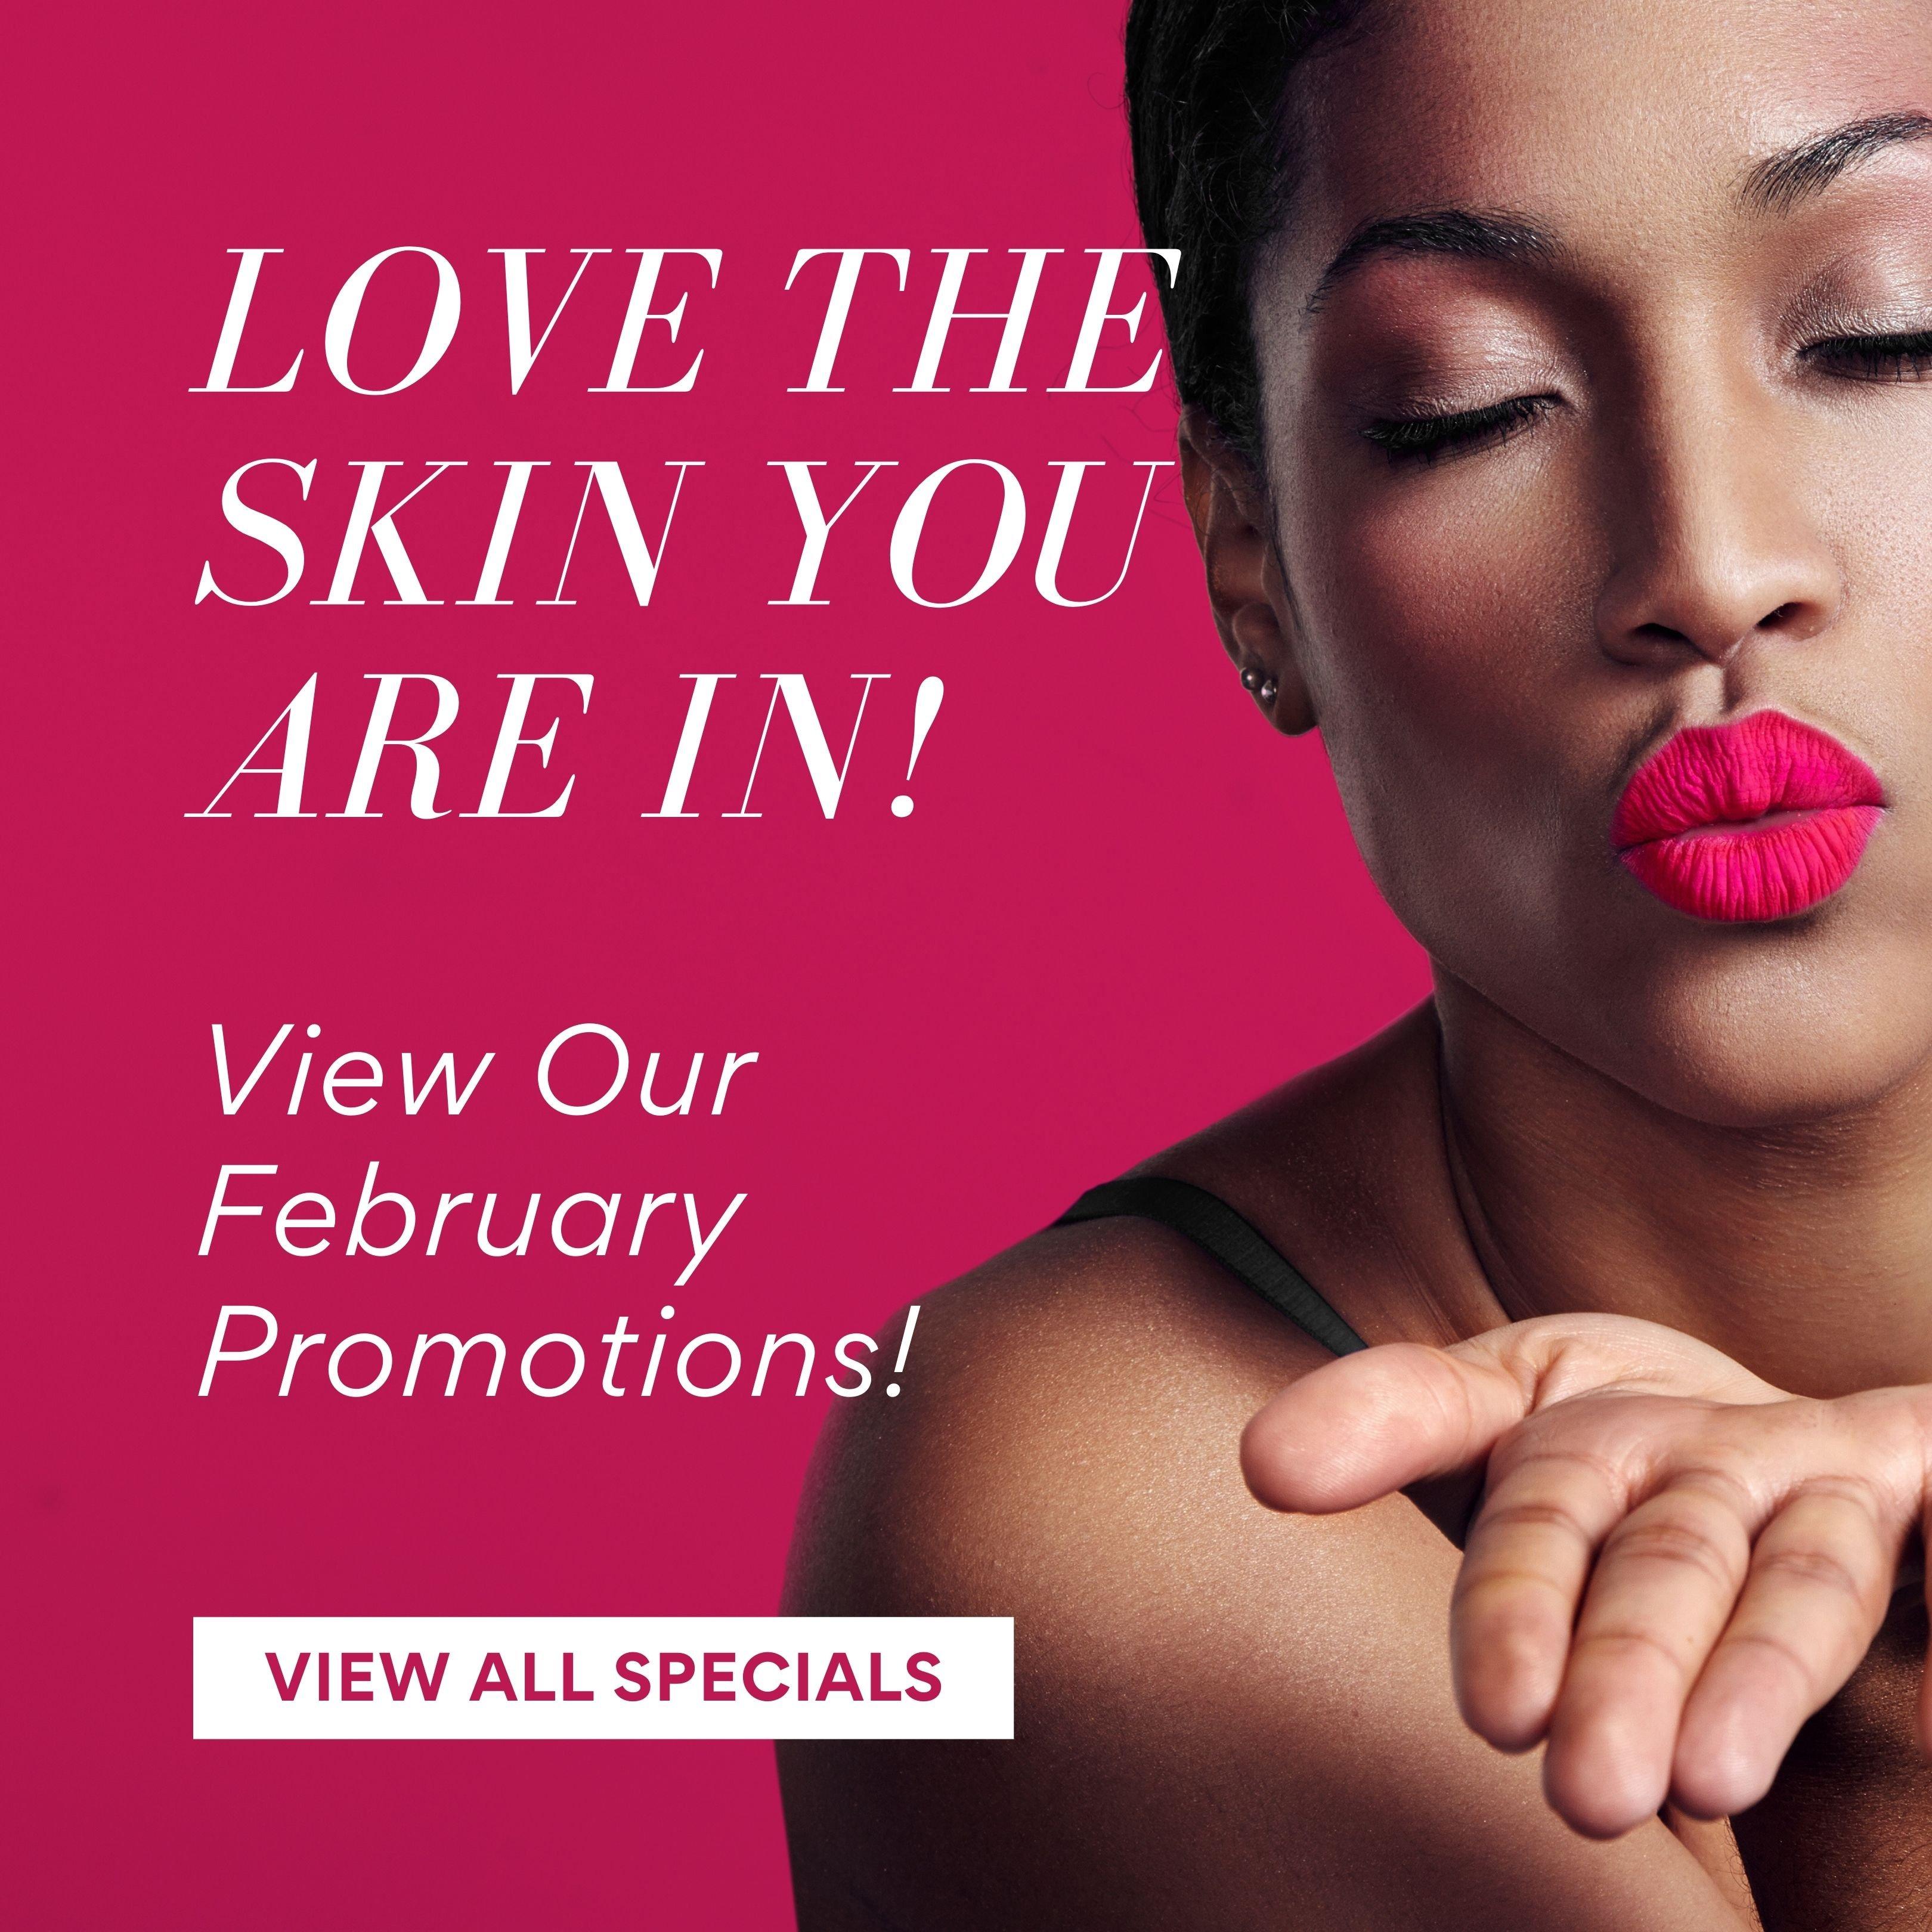 February Homepage Promos